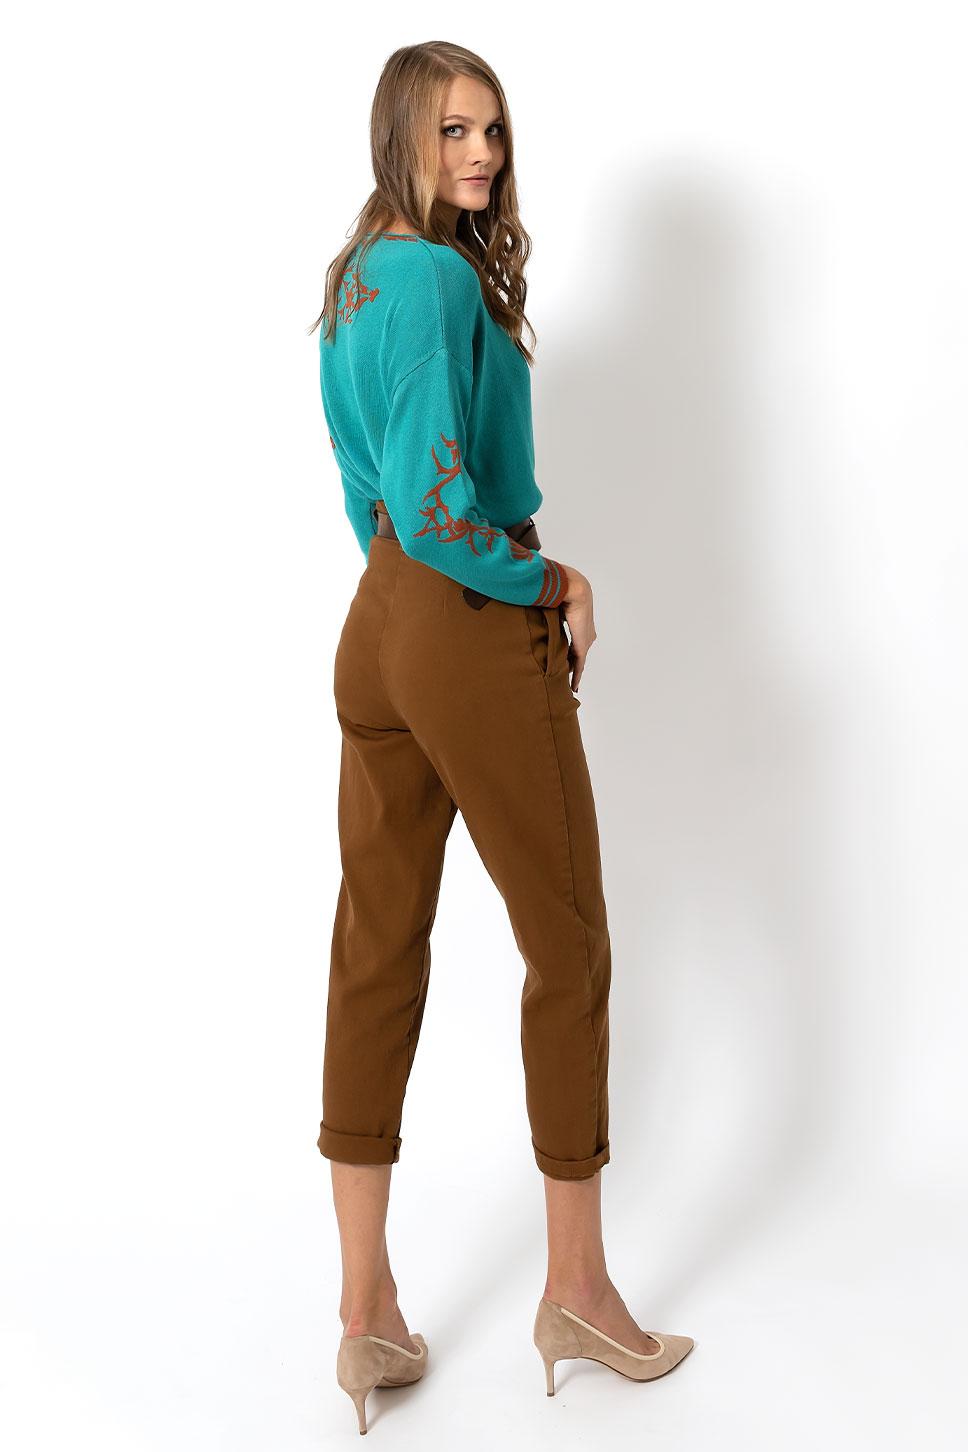 Pantalone chino a vita alta di Bec